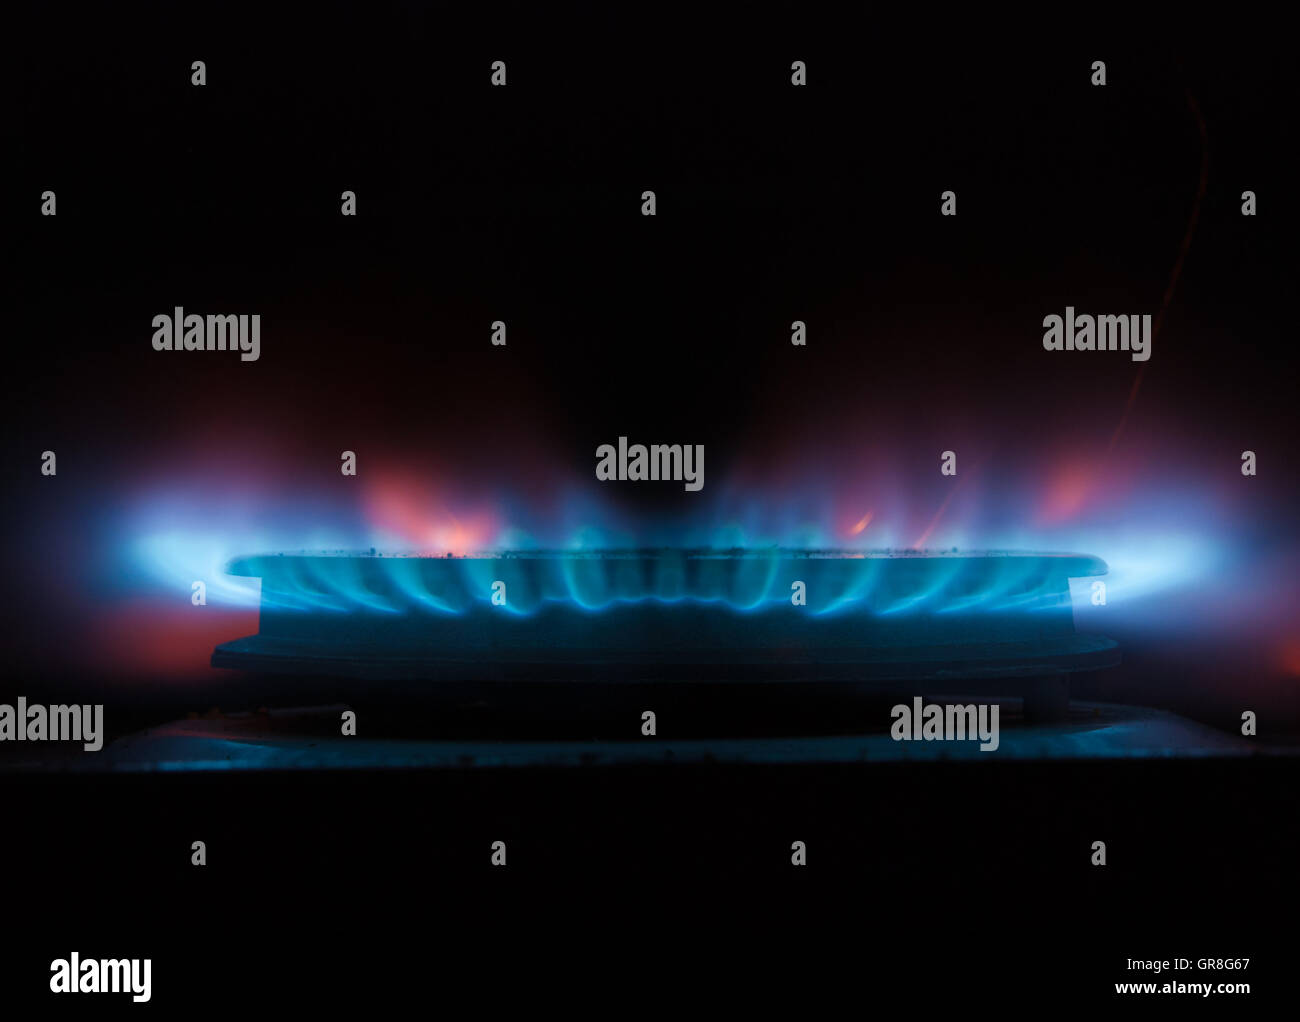 Gas Hob Ring - Stock Image